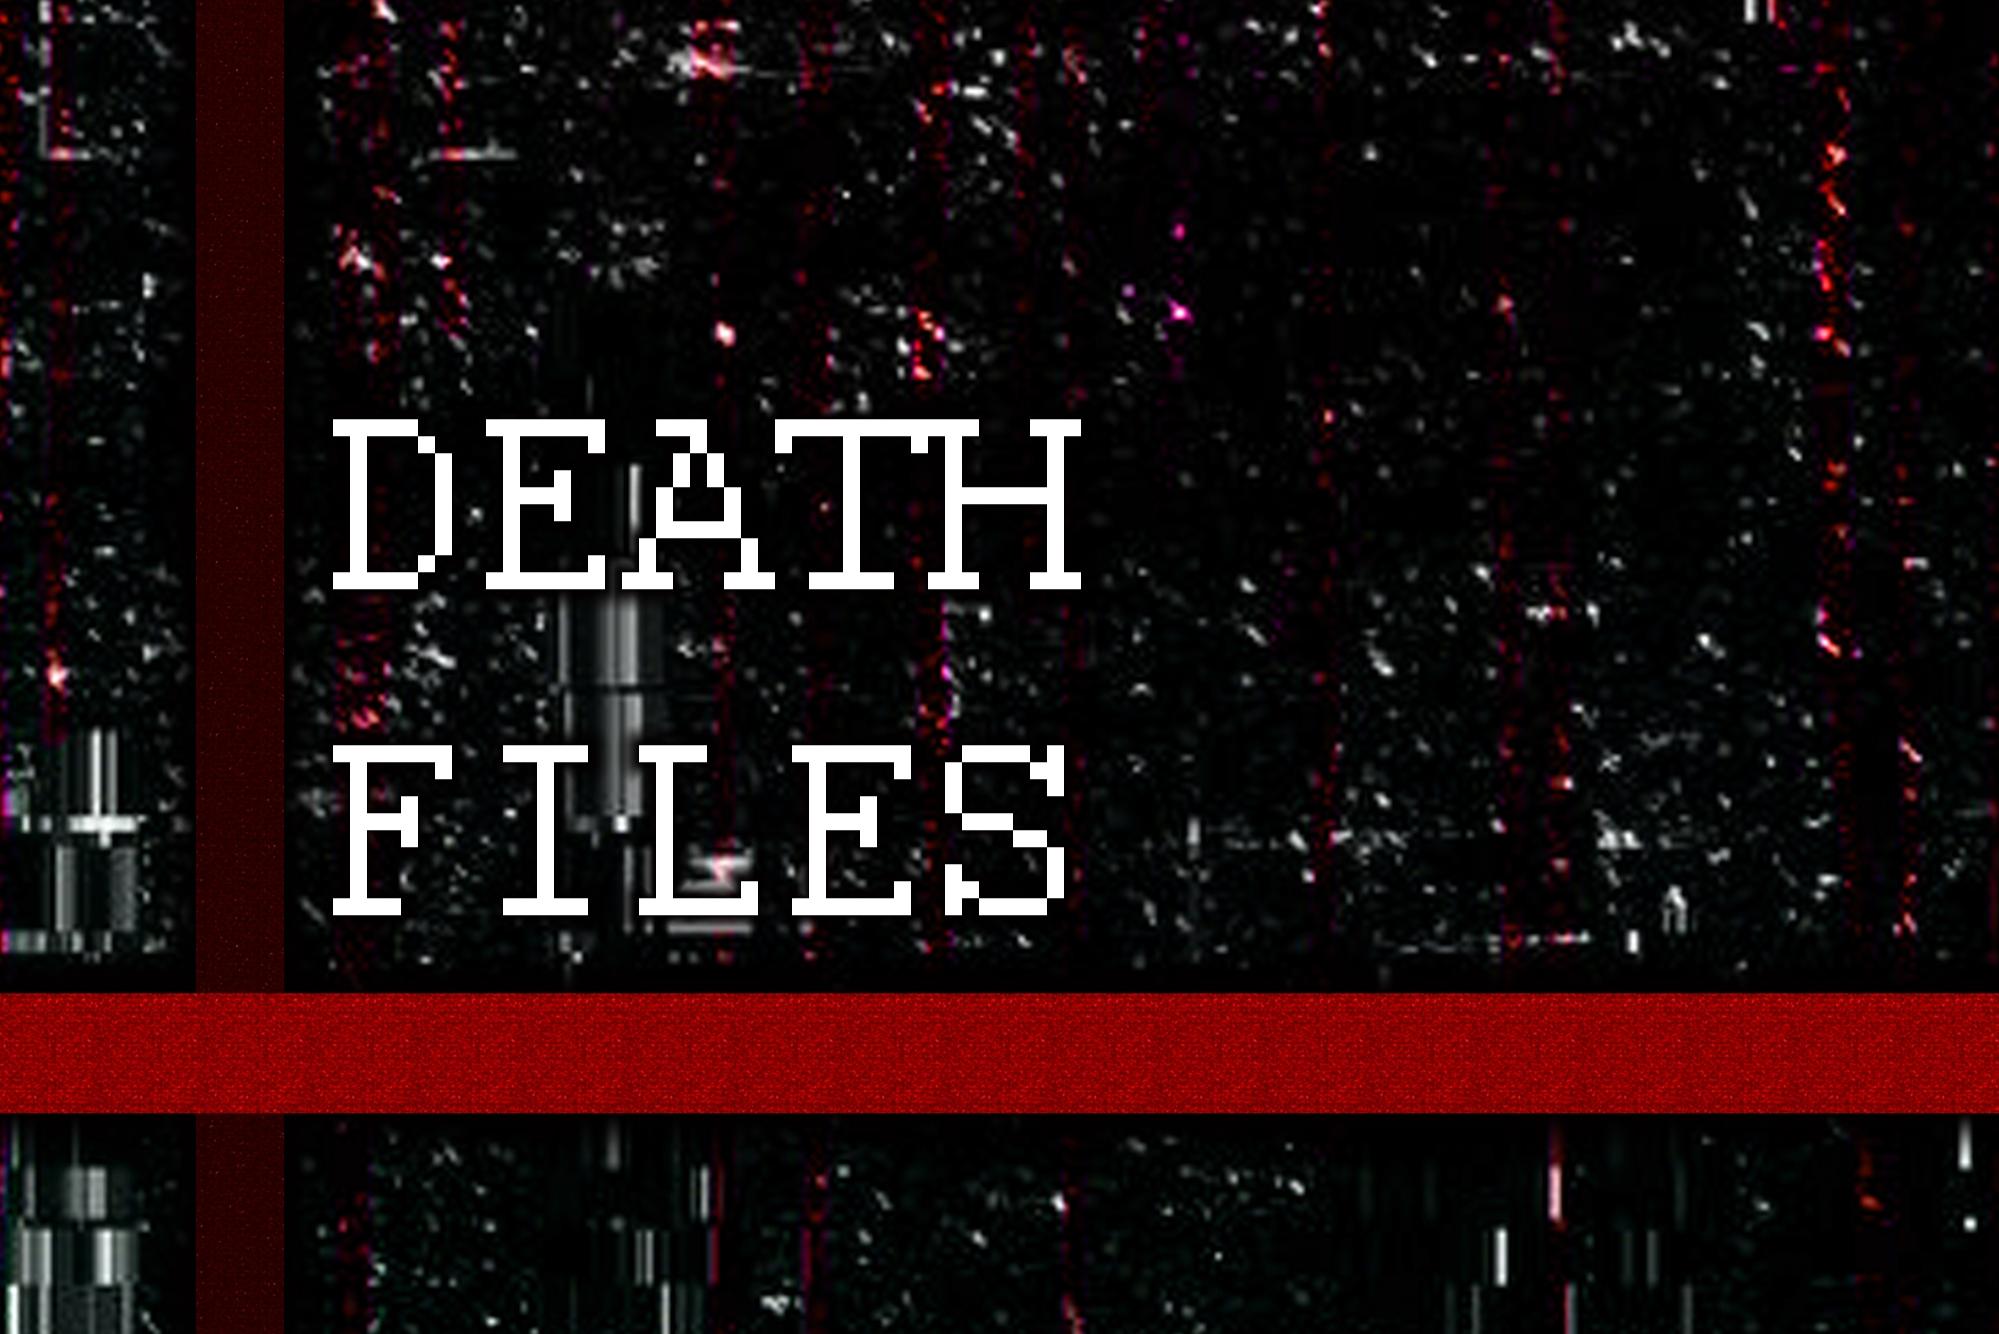 Death Files (2020) WEBDL Subtitle Indonesia